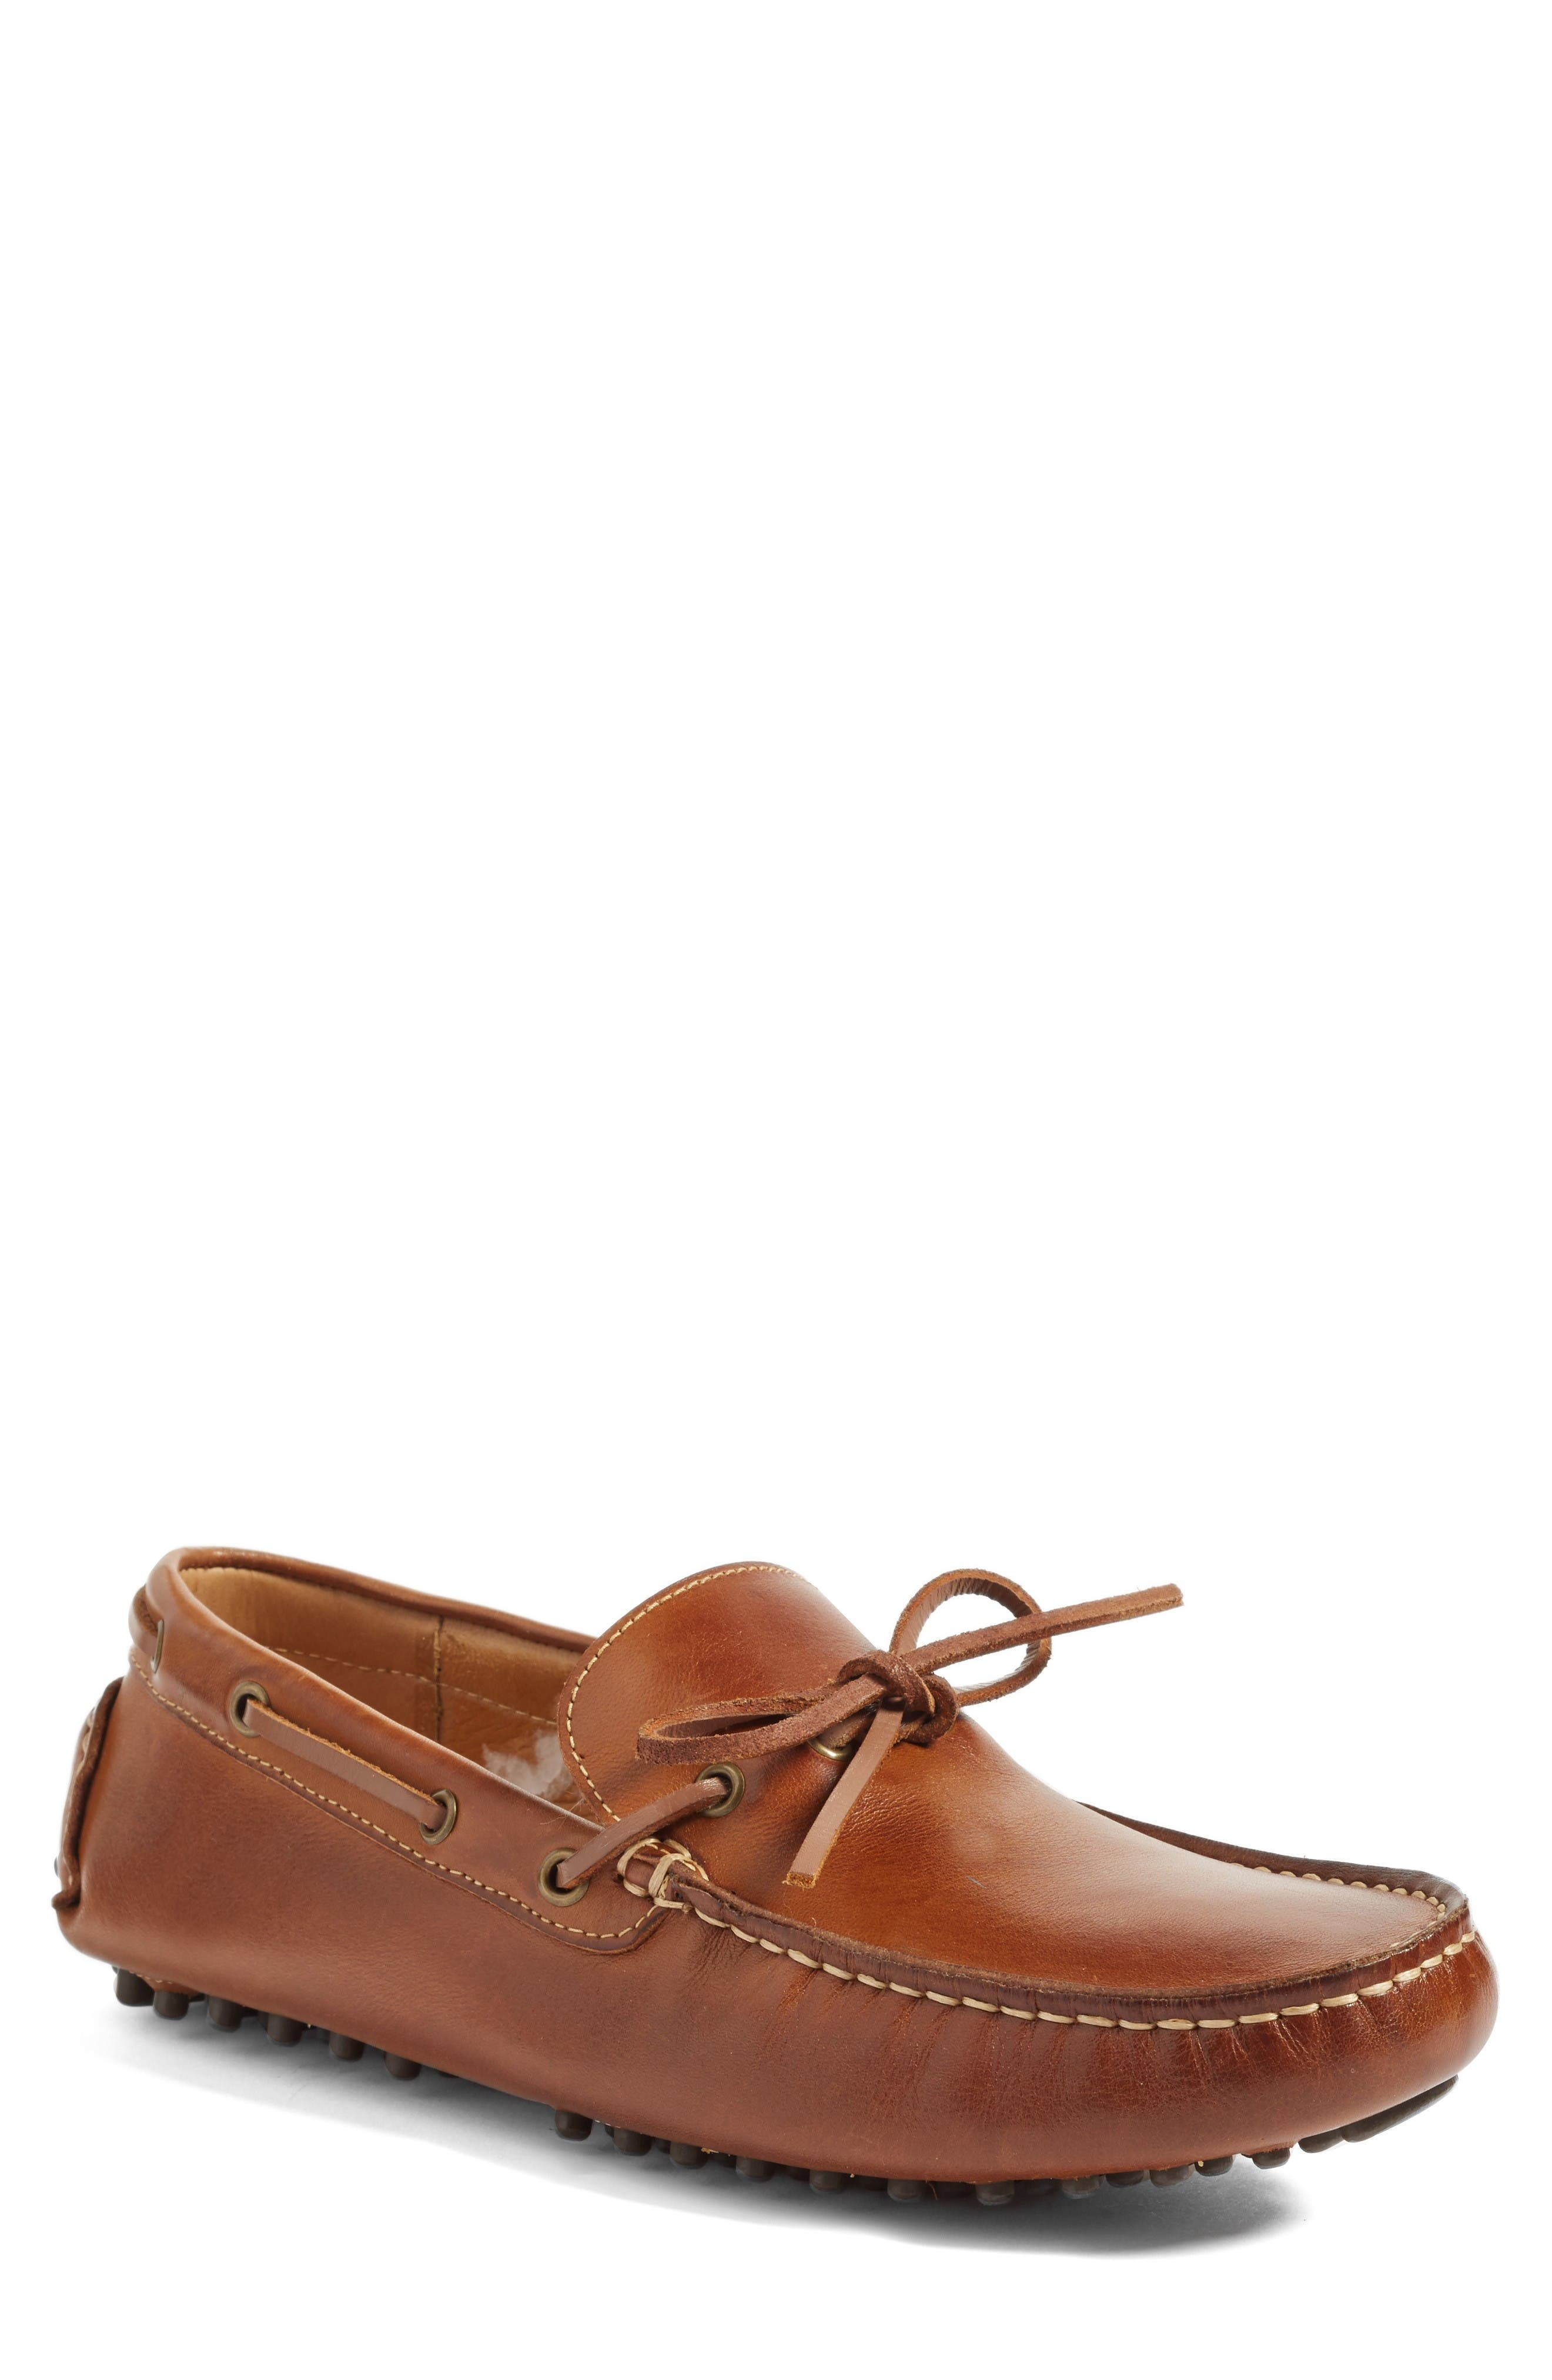 Alternate Image 1 Selected - John W. Nordstrom® Midland Driving Shoe (Men)